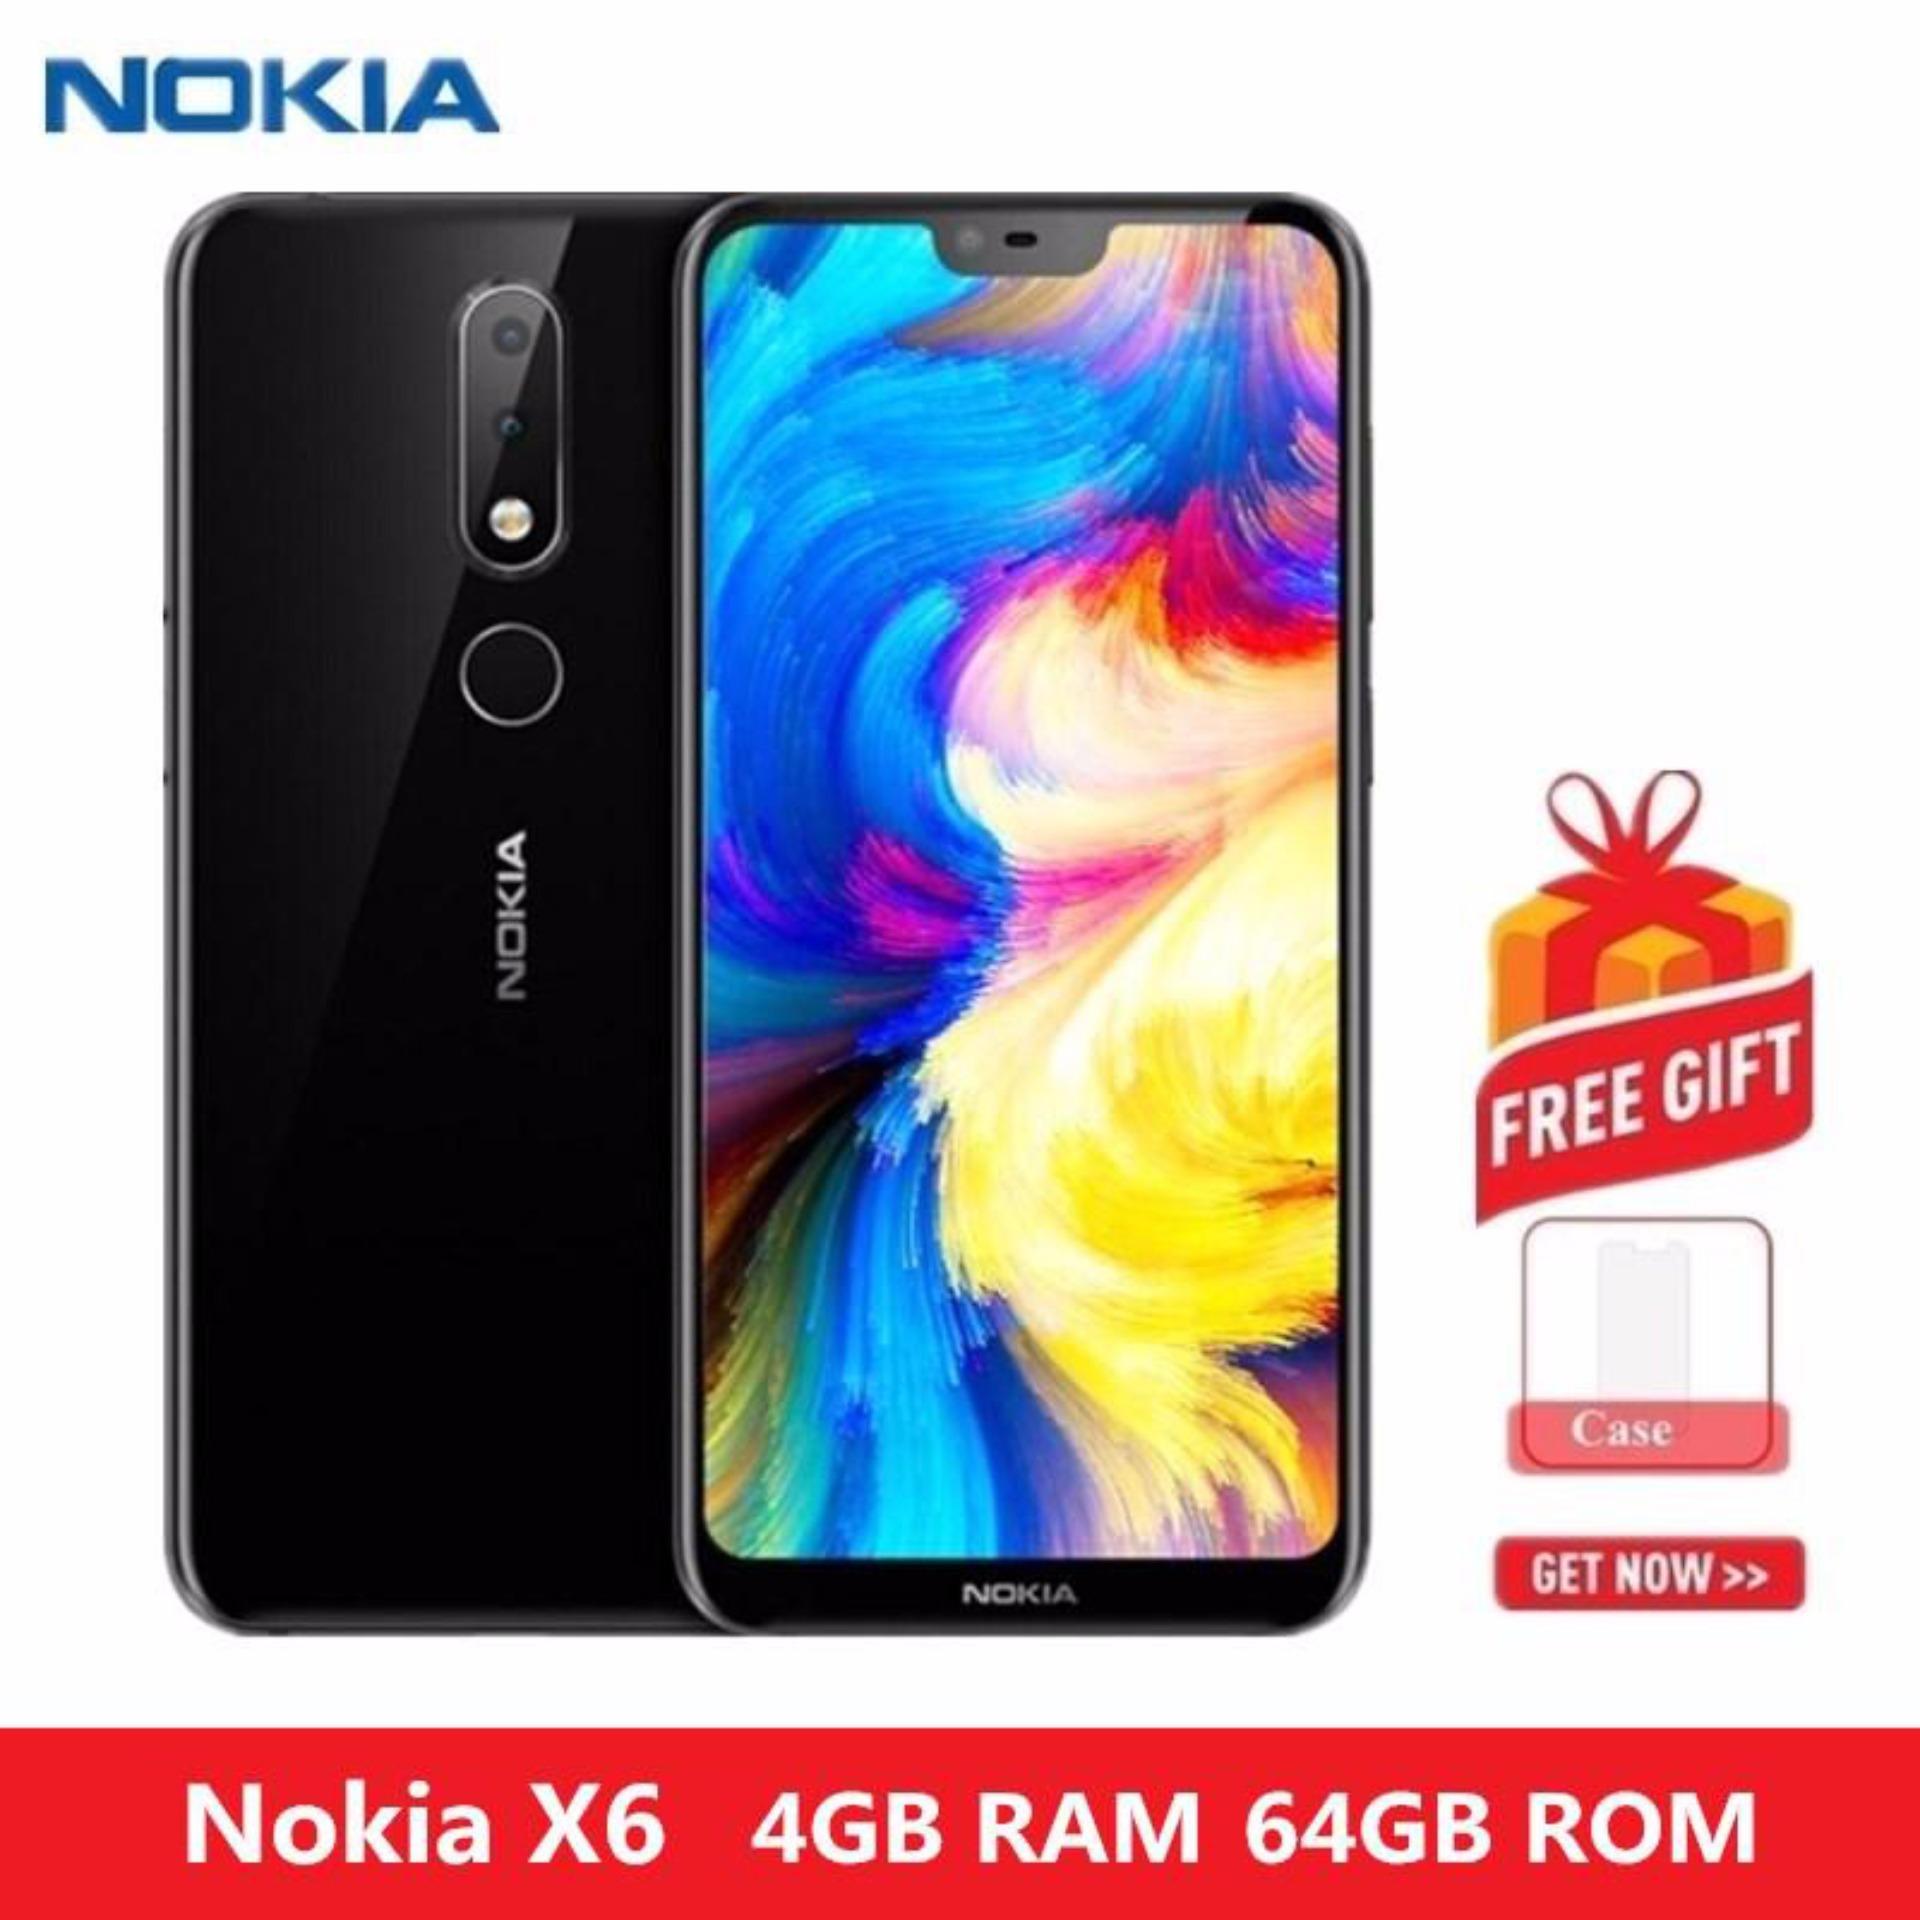 Nokia Philippines Price List Phones Smartphones Casing 2630 With Face Idoriginal X6 61 Plus Android One